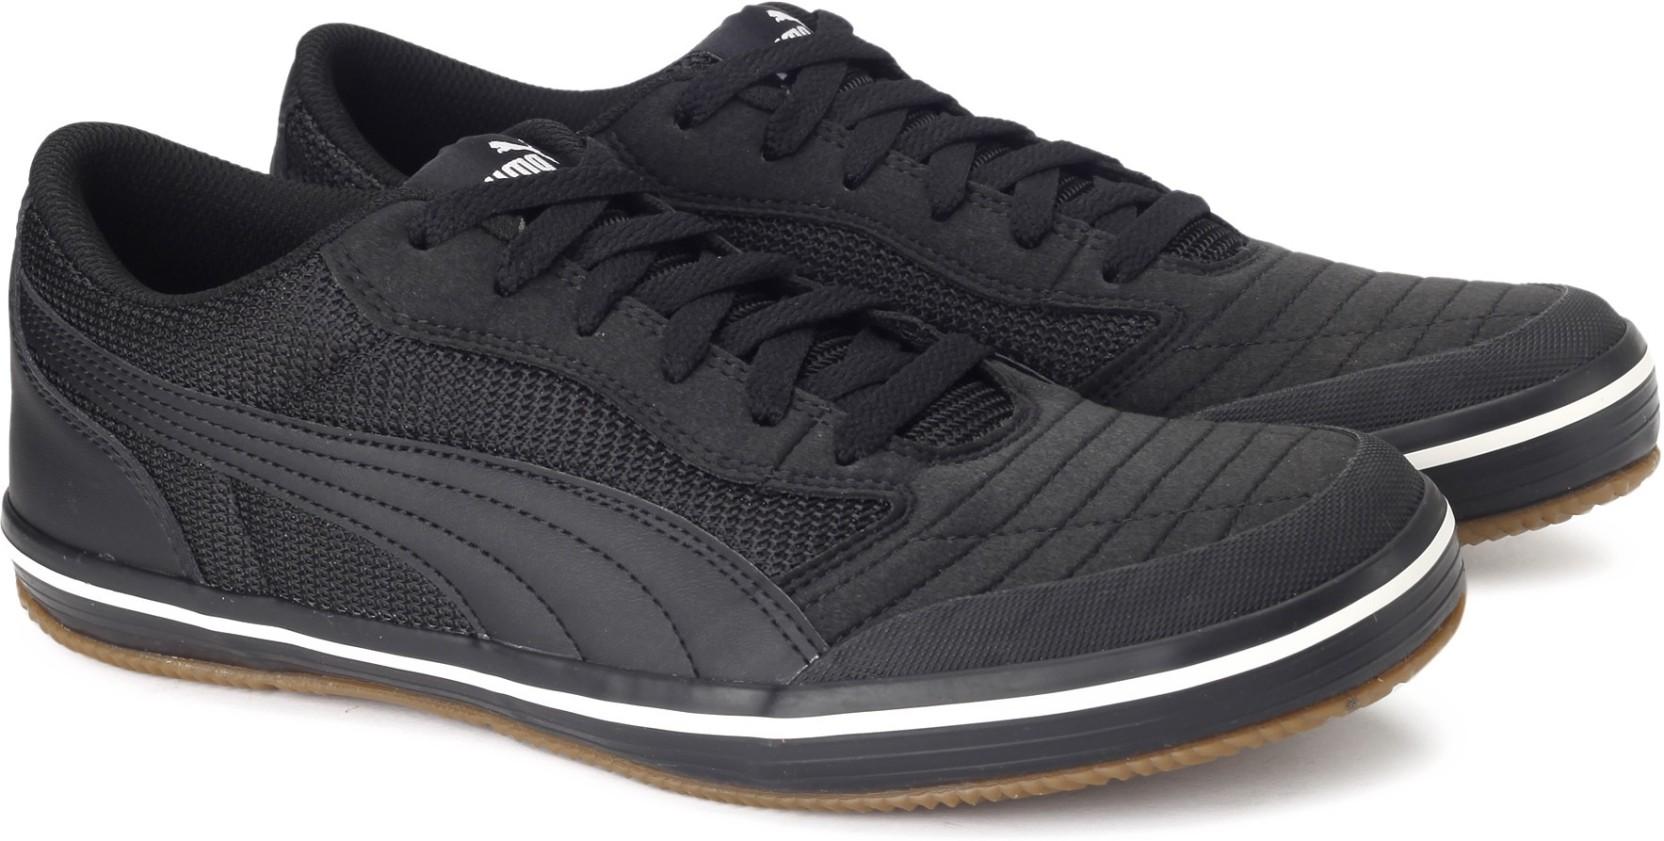 Puma Astro Sala Sneakers For Men - Buy Puma Black-Puma Black Color ... e957f35731a2